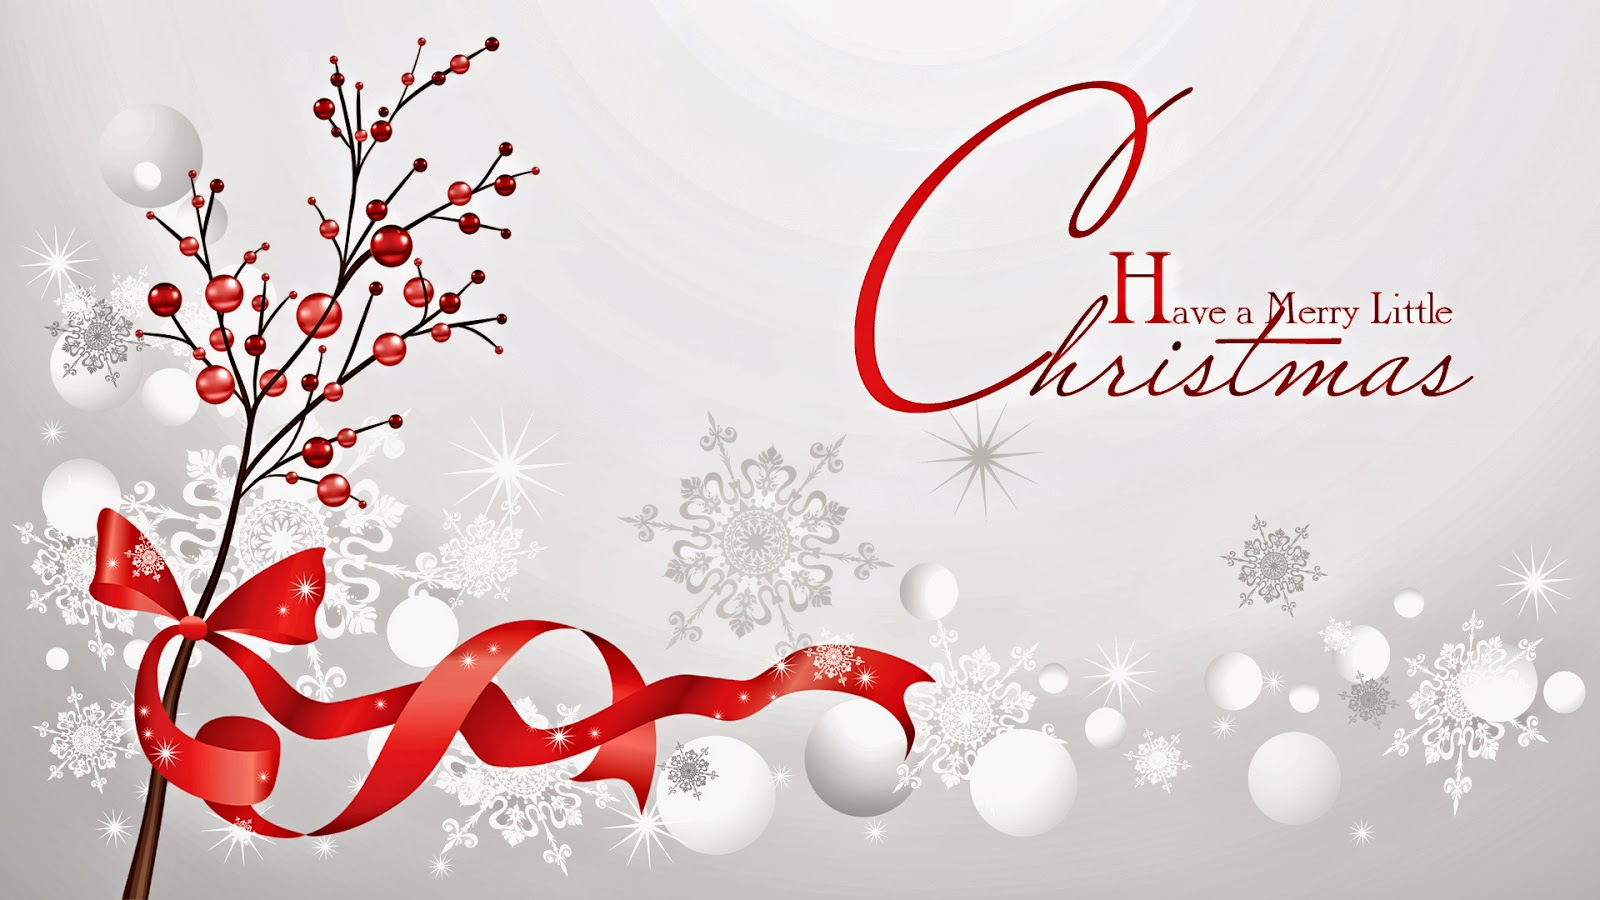 Ravishment: Merry Christmas Celebration 2013 Wishes HD ...